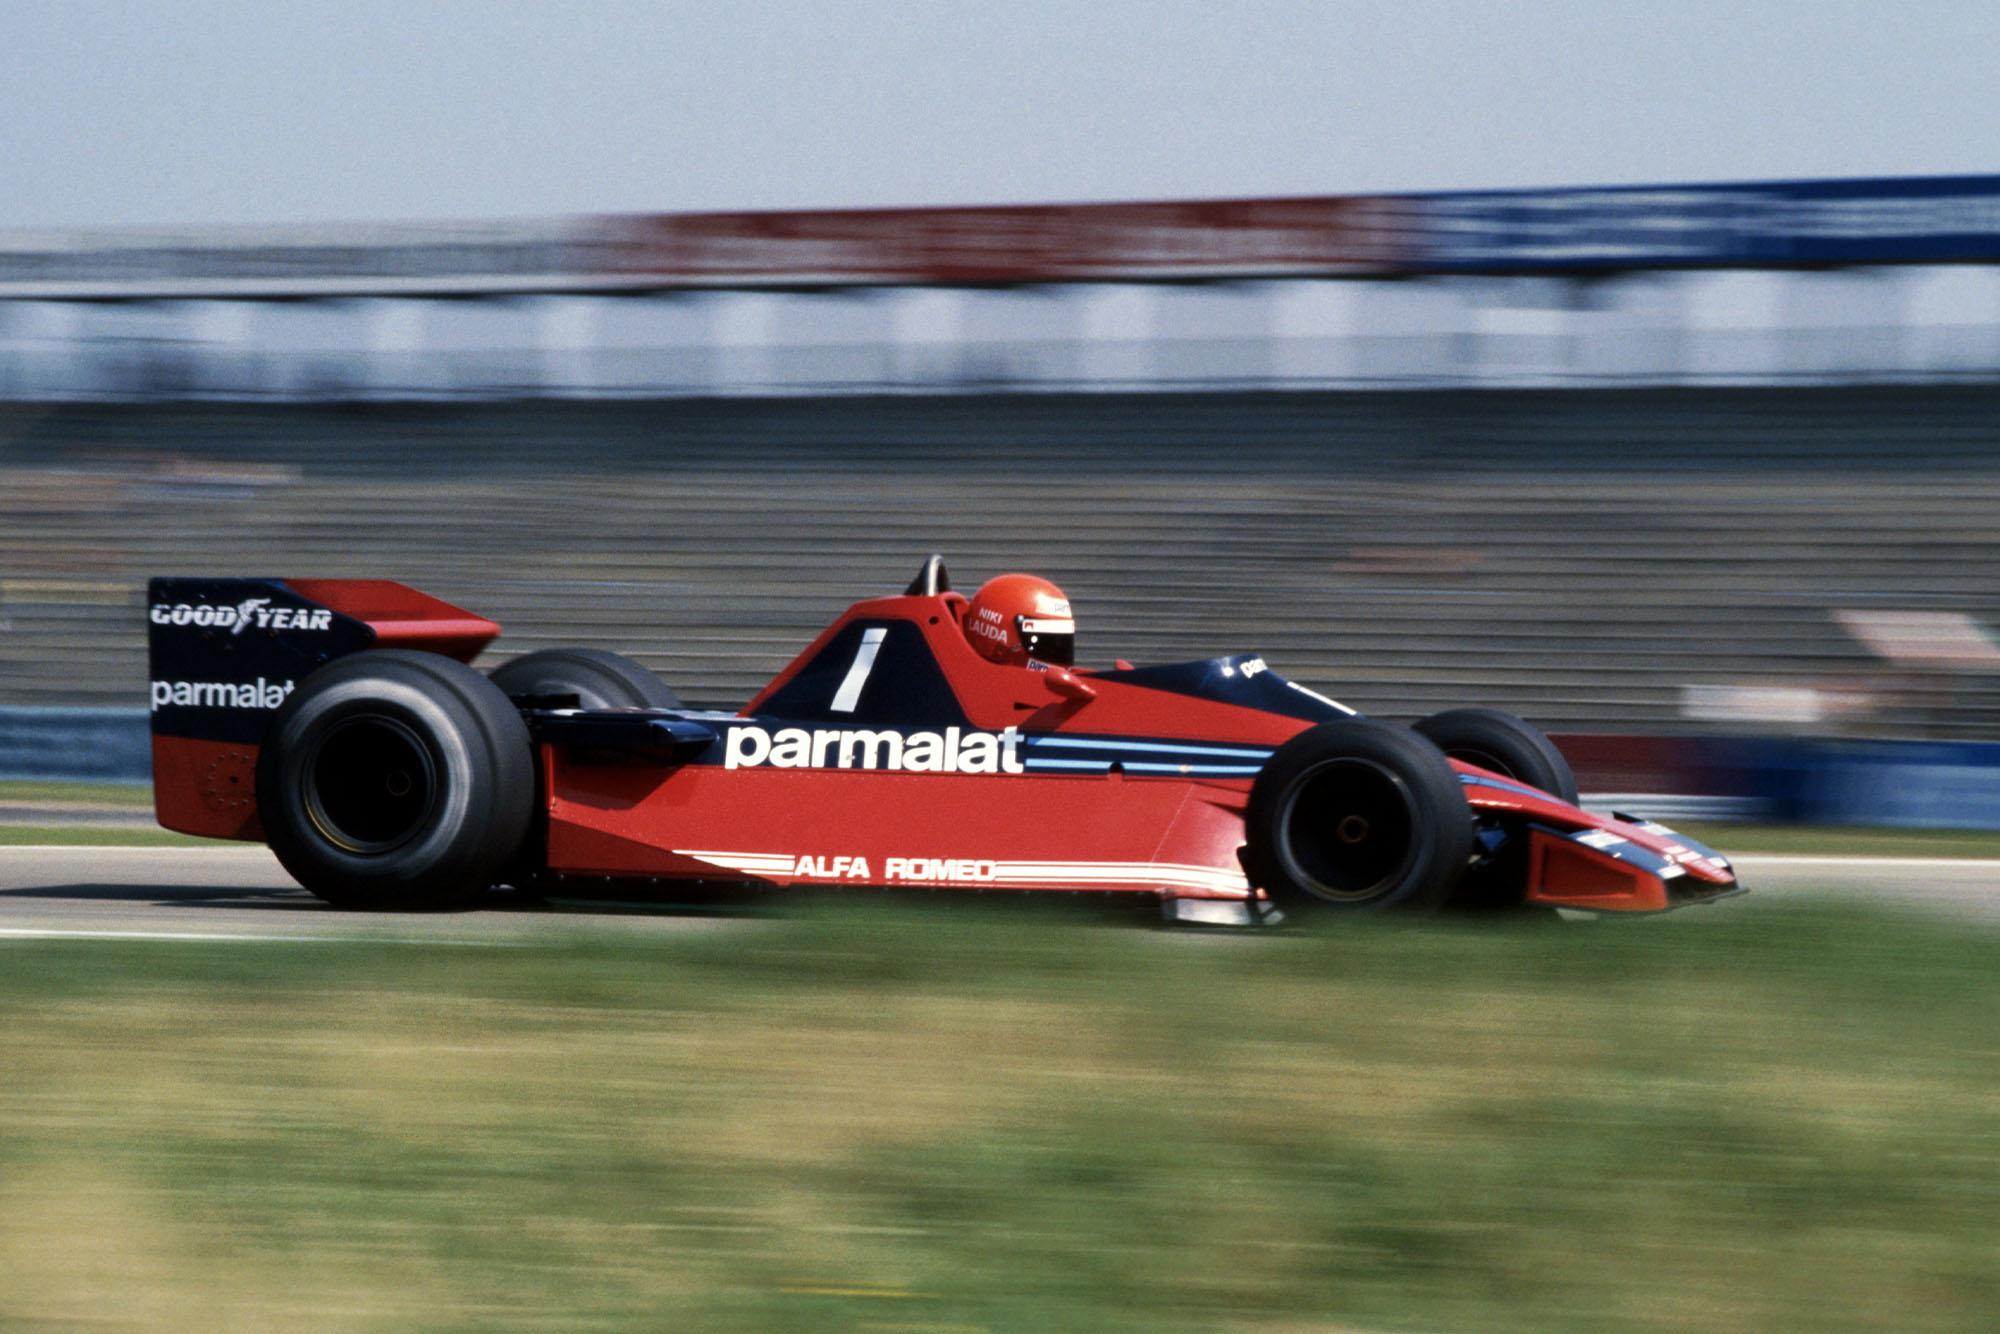 Niki Lauda (Brabham) driving at the 1978 German Grand Prix, Hockenheim.